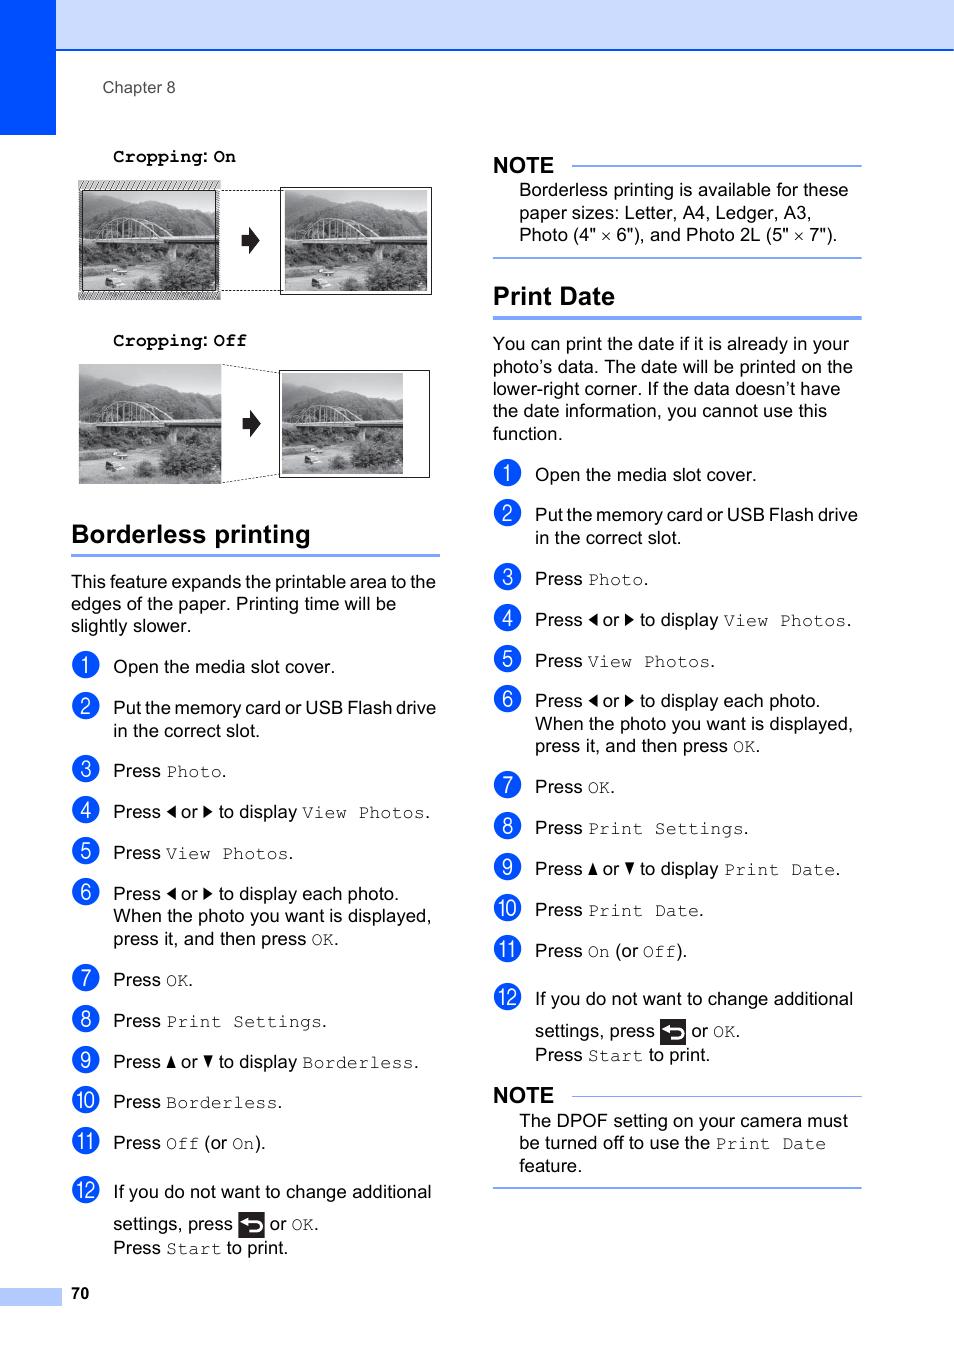 Borderless printing, Print date, Borderless printing print